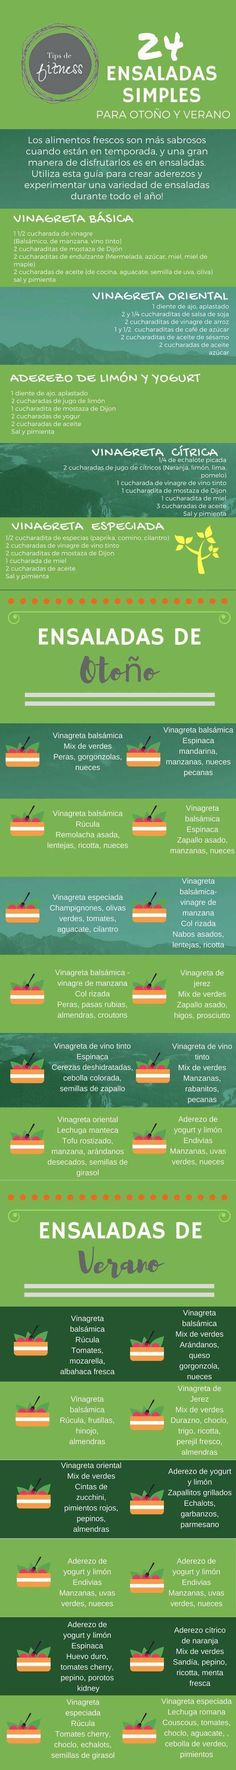 24 formas de preparar ensaladas tanto en invierno como en otoño.  #ensaladas #infografias #nutricion #nutricioninfografia